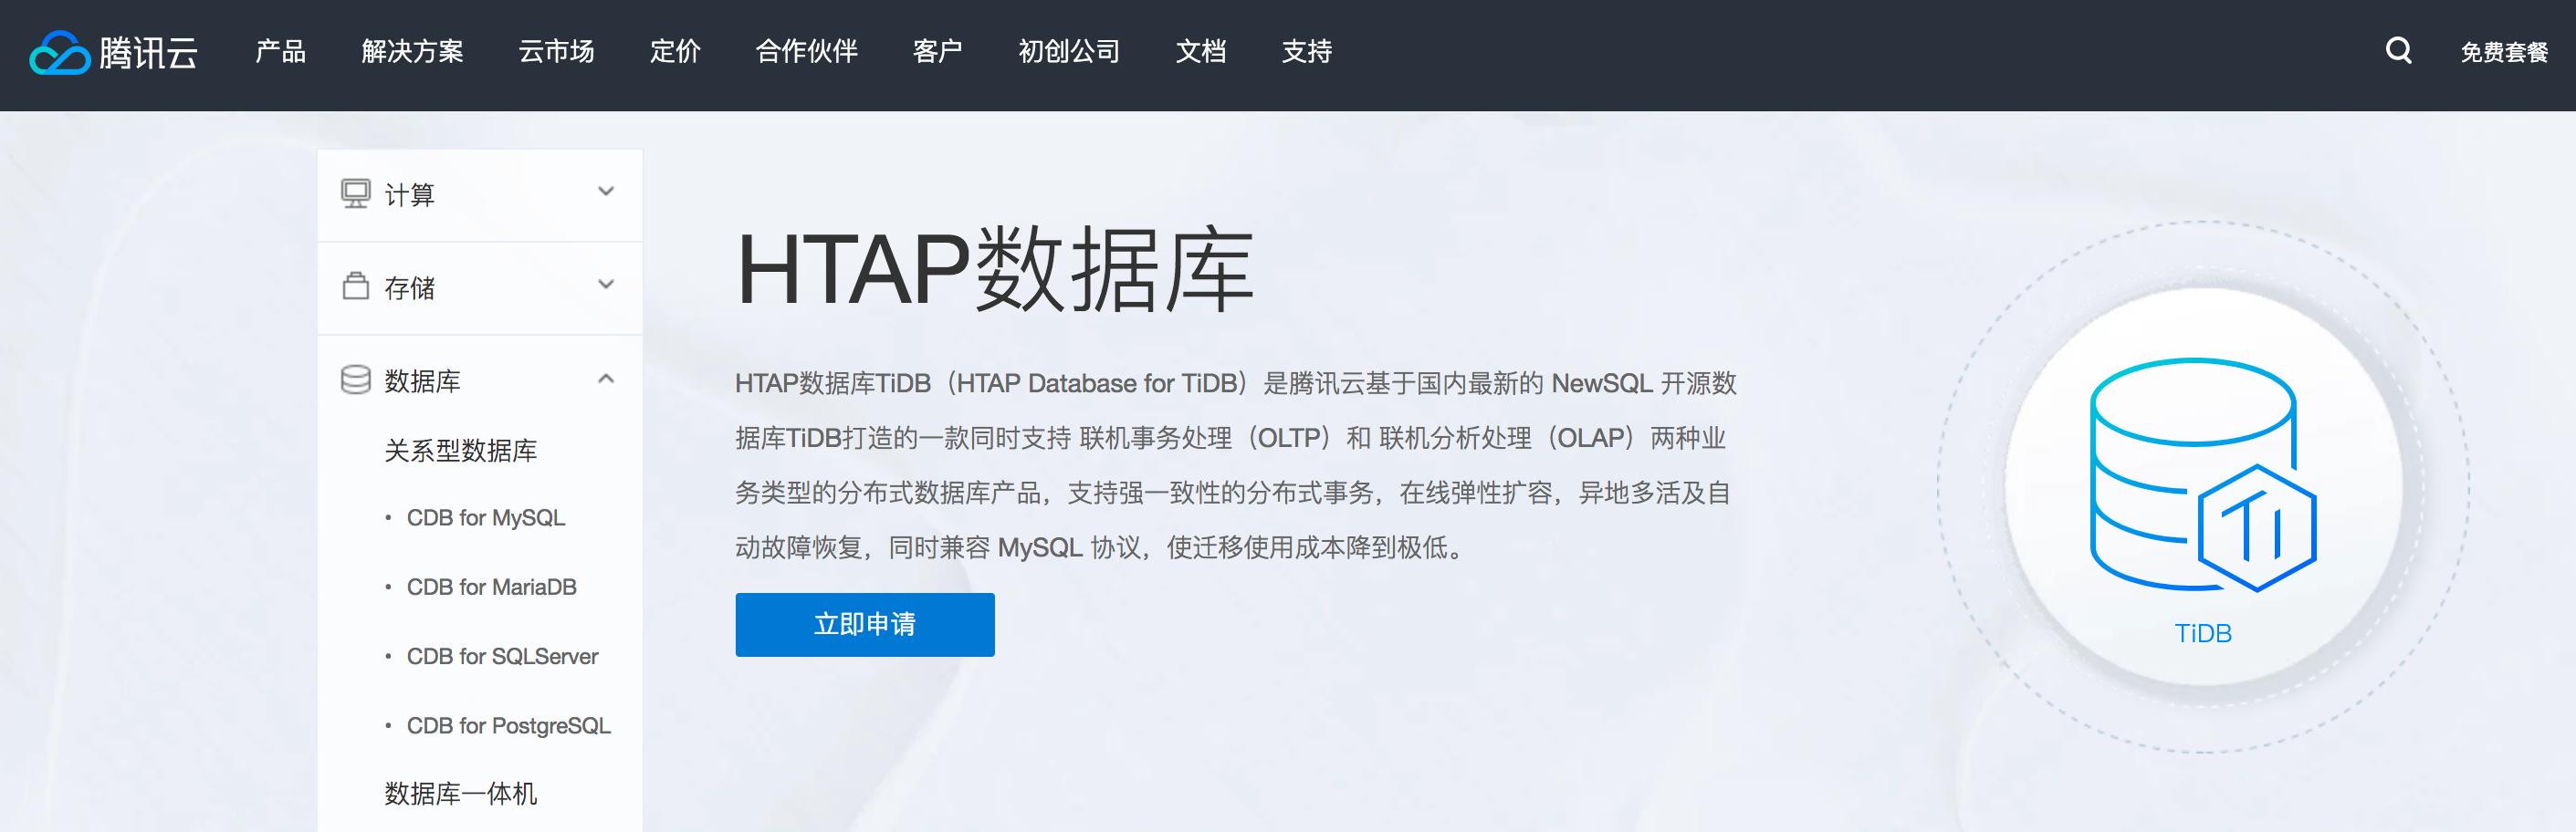 PingCAP 与腾讯云达成合作,HTAP 数据库 TiDB 现开放内测